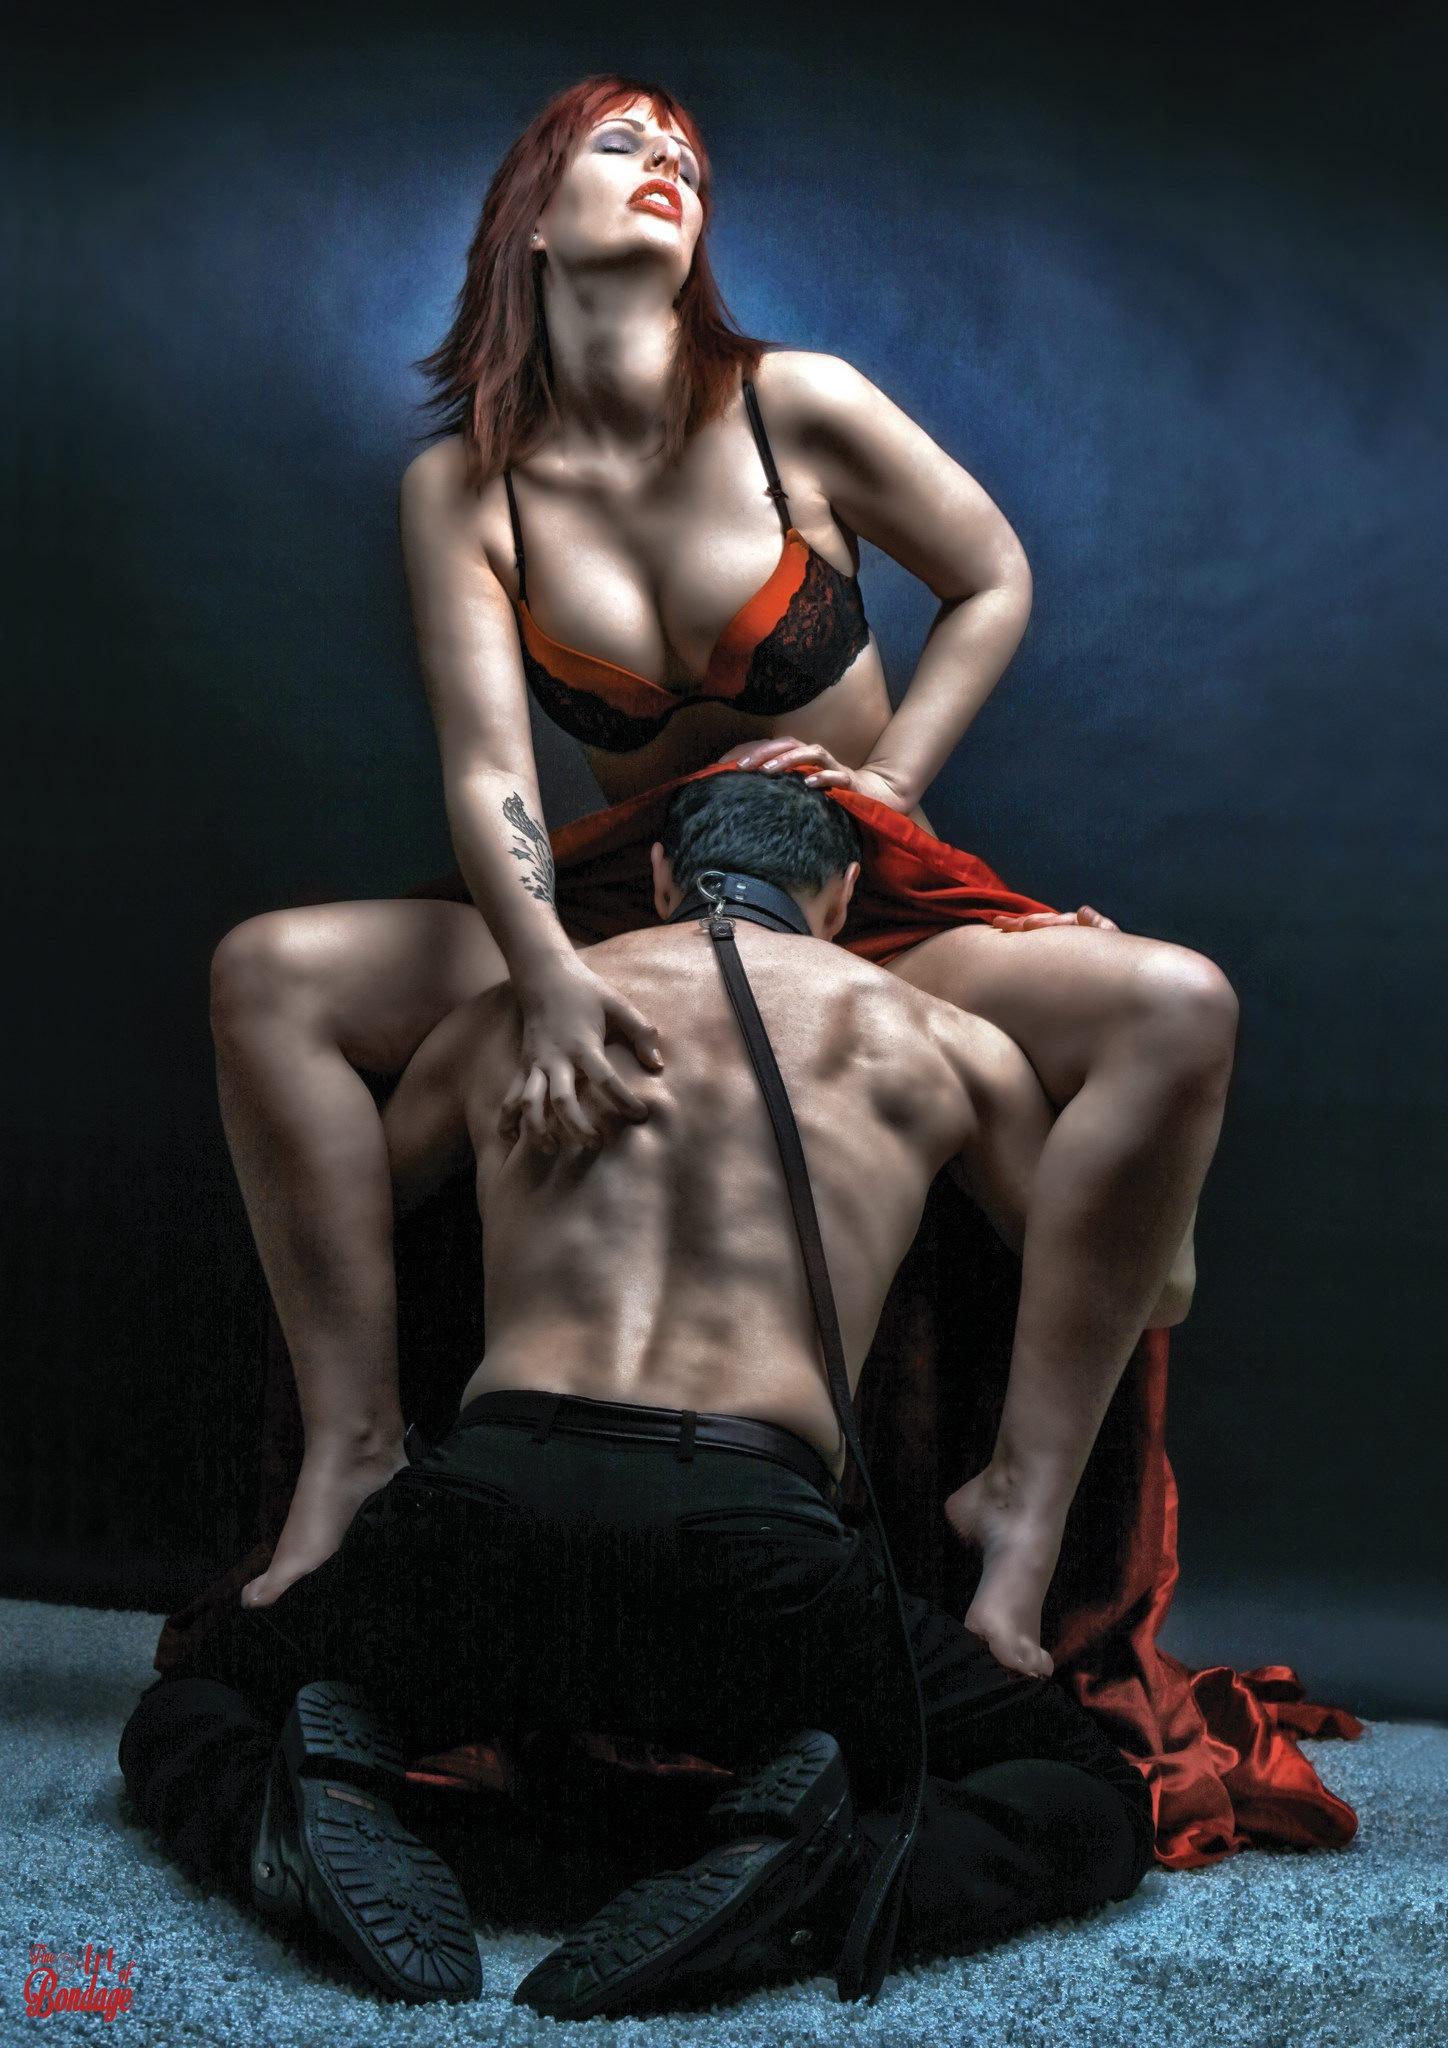 Scarlet johanssen sex scene